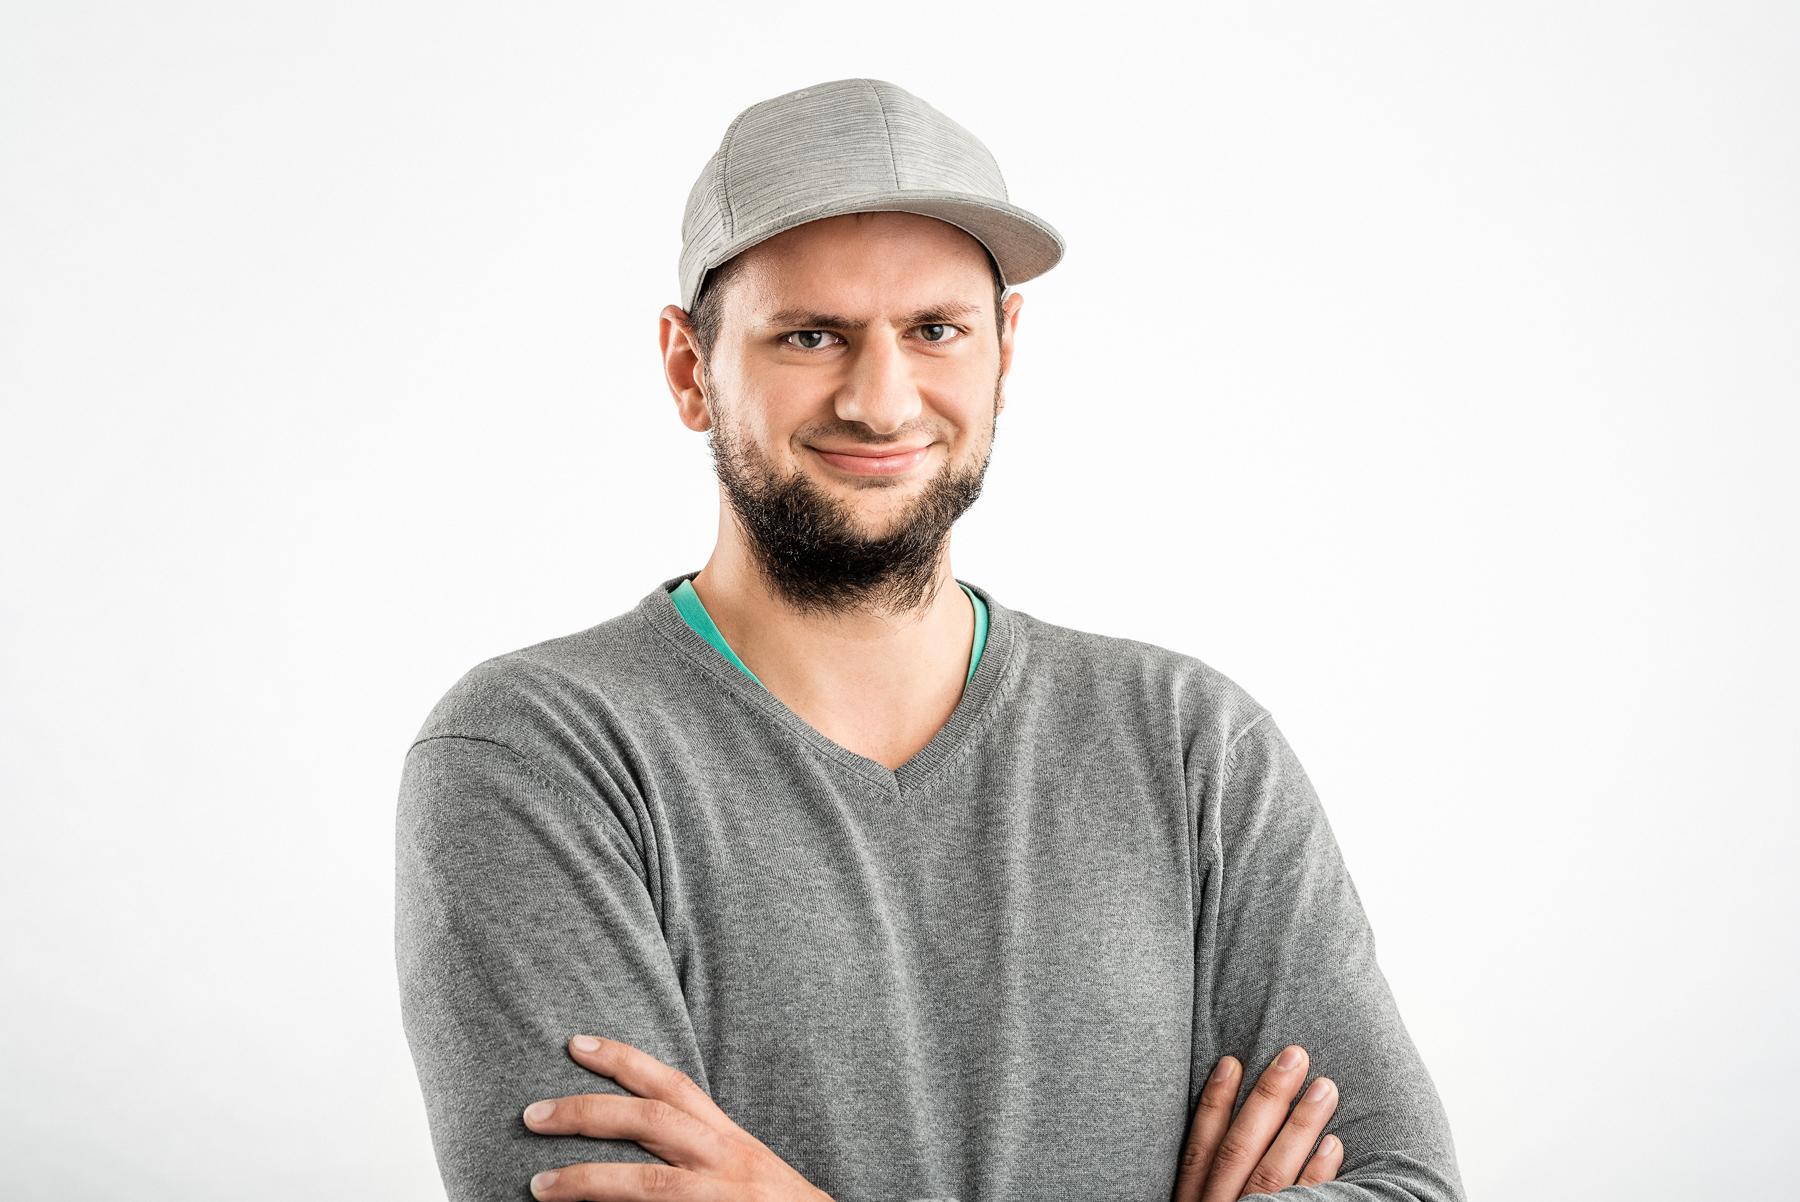 Profilbild des Autors